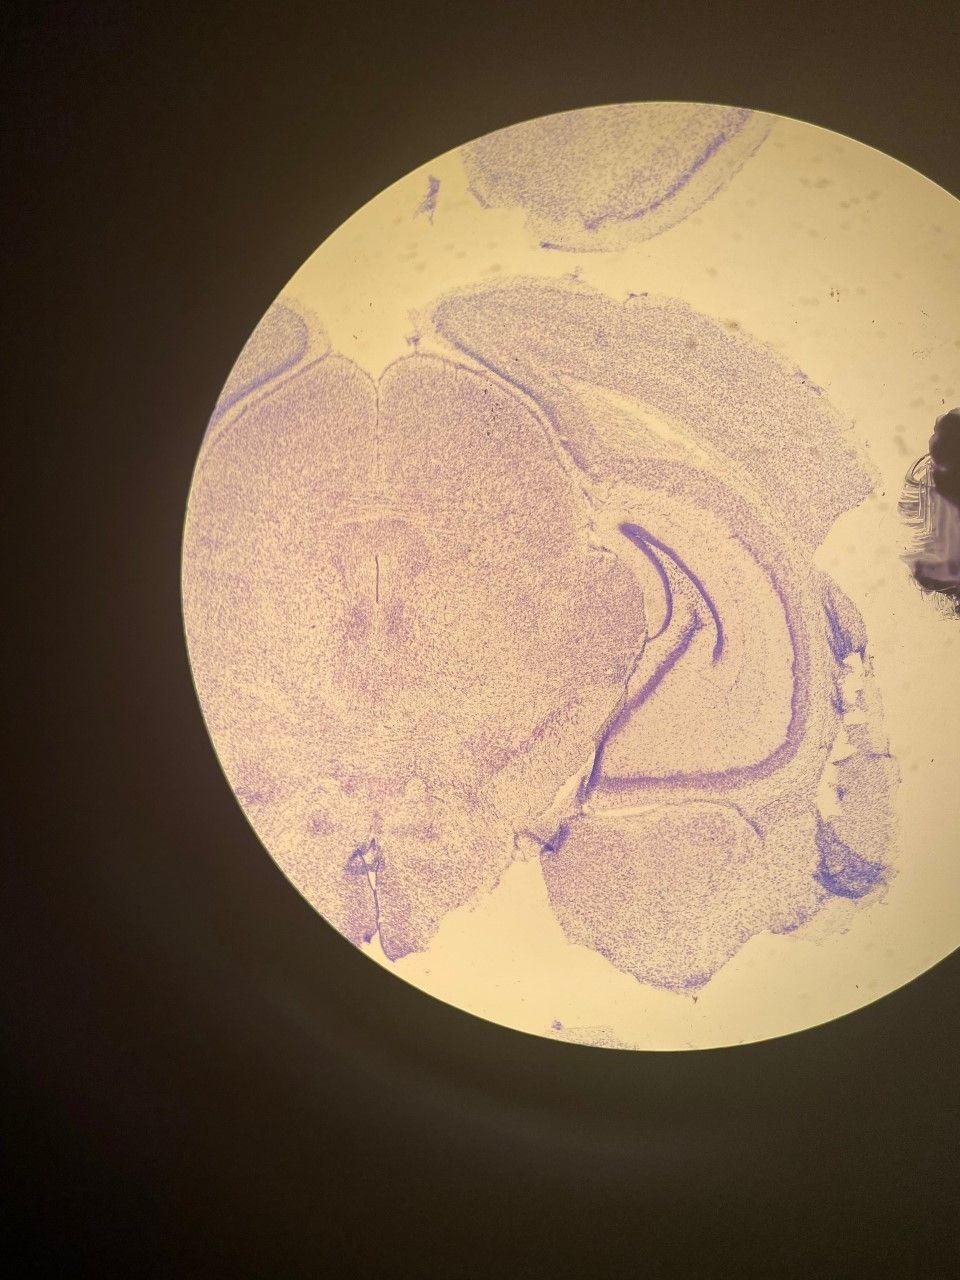 Image: Microscopy of brain tissue. Credit: Merrin Monteith